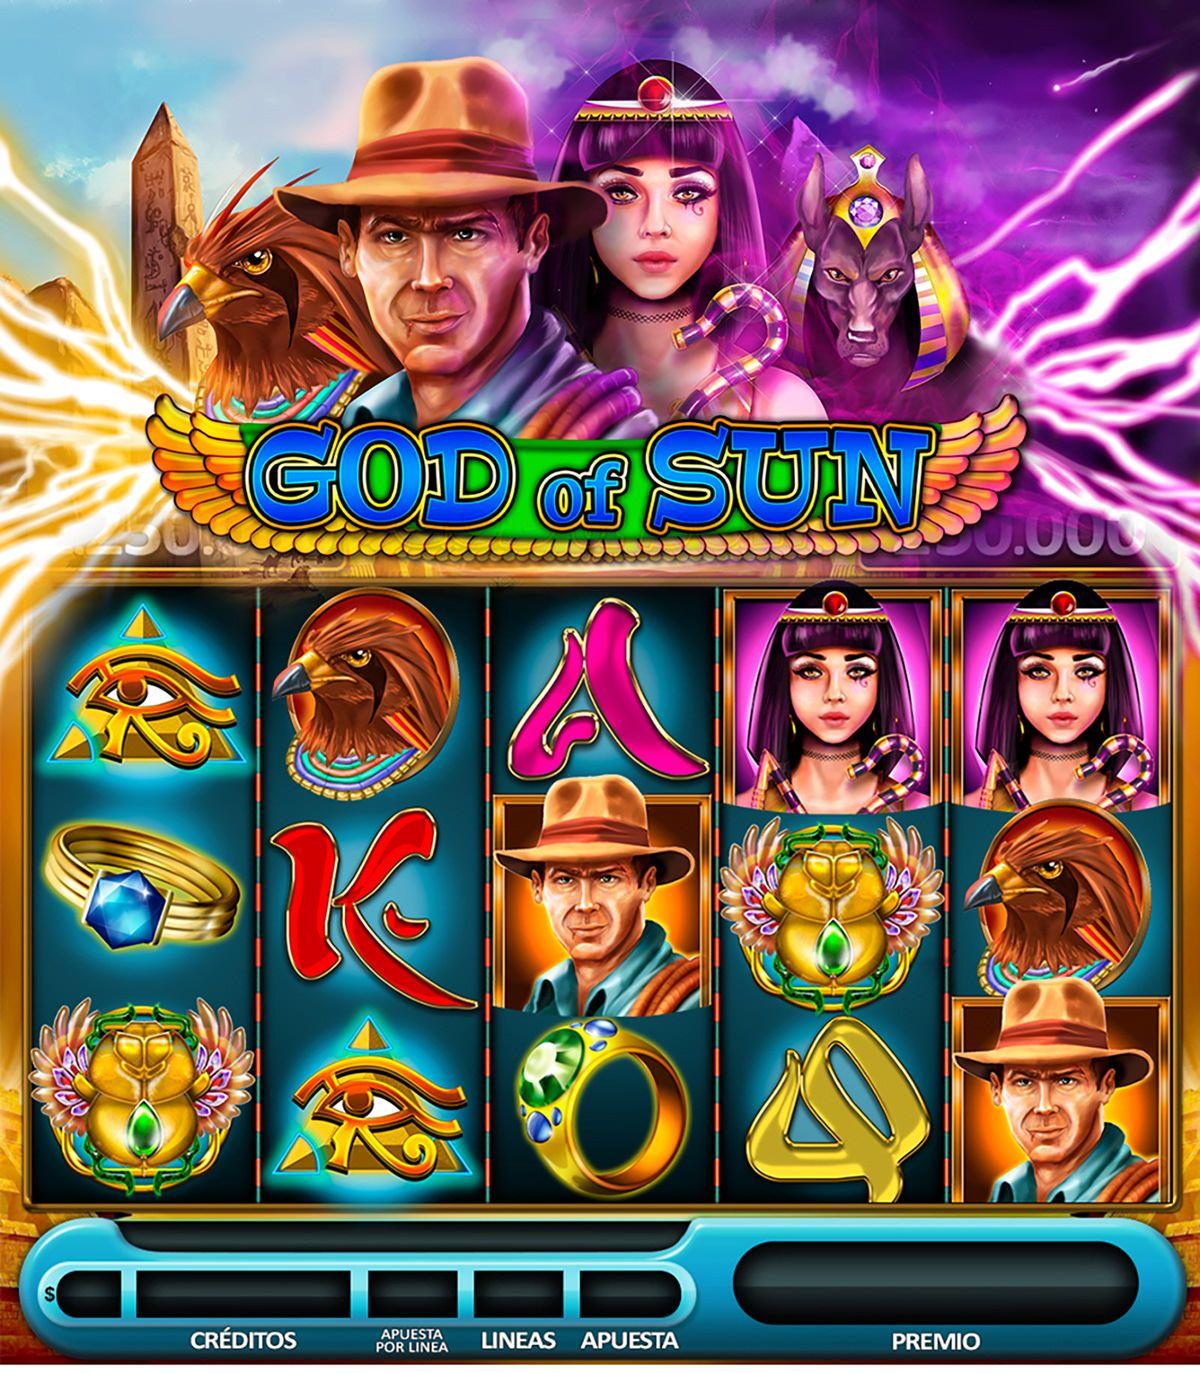 God of sun zoeslots slot game egypt